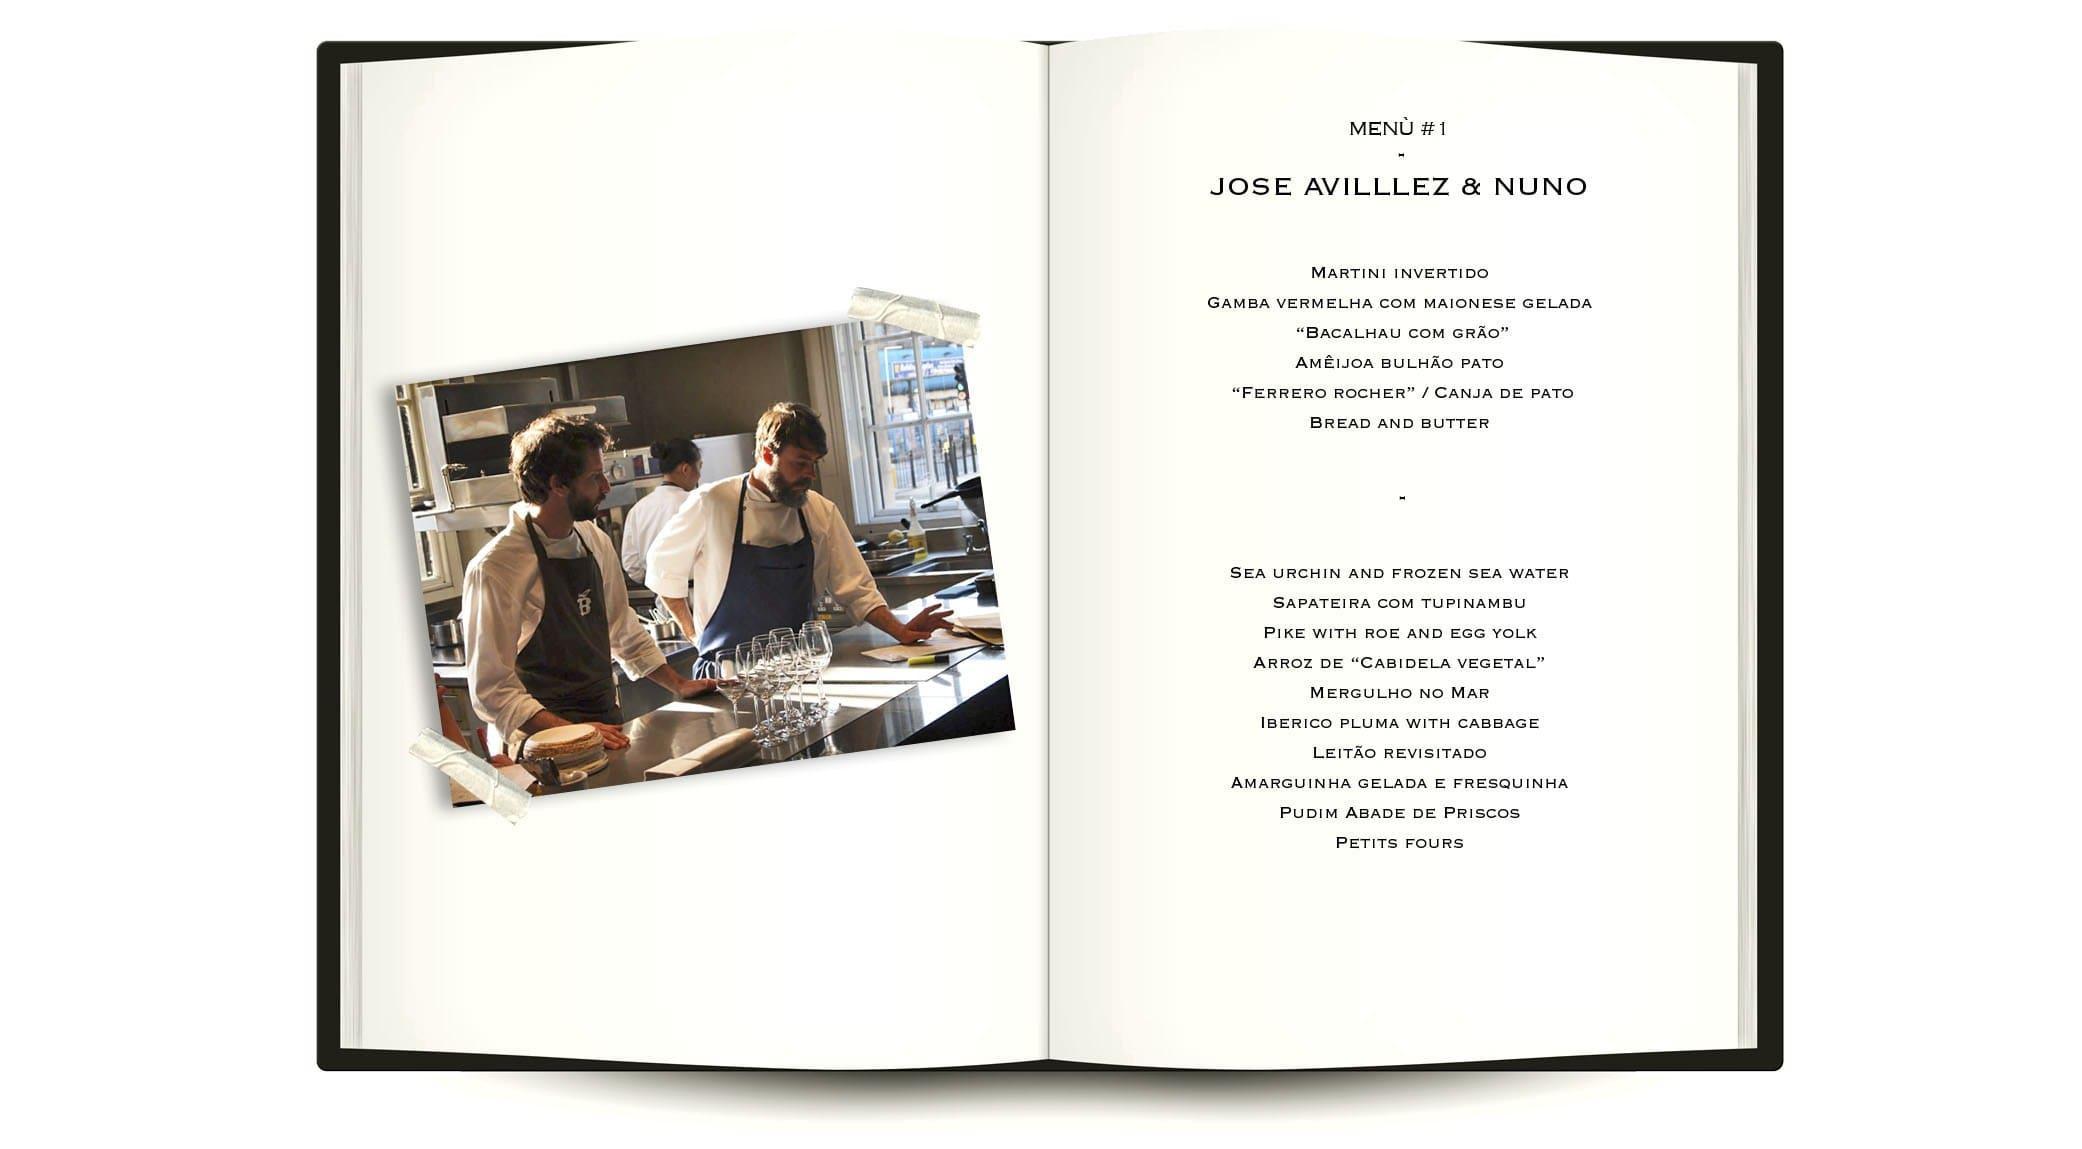 original_menu1-jose-avillez-nuno.jpg